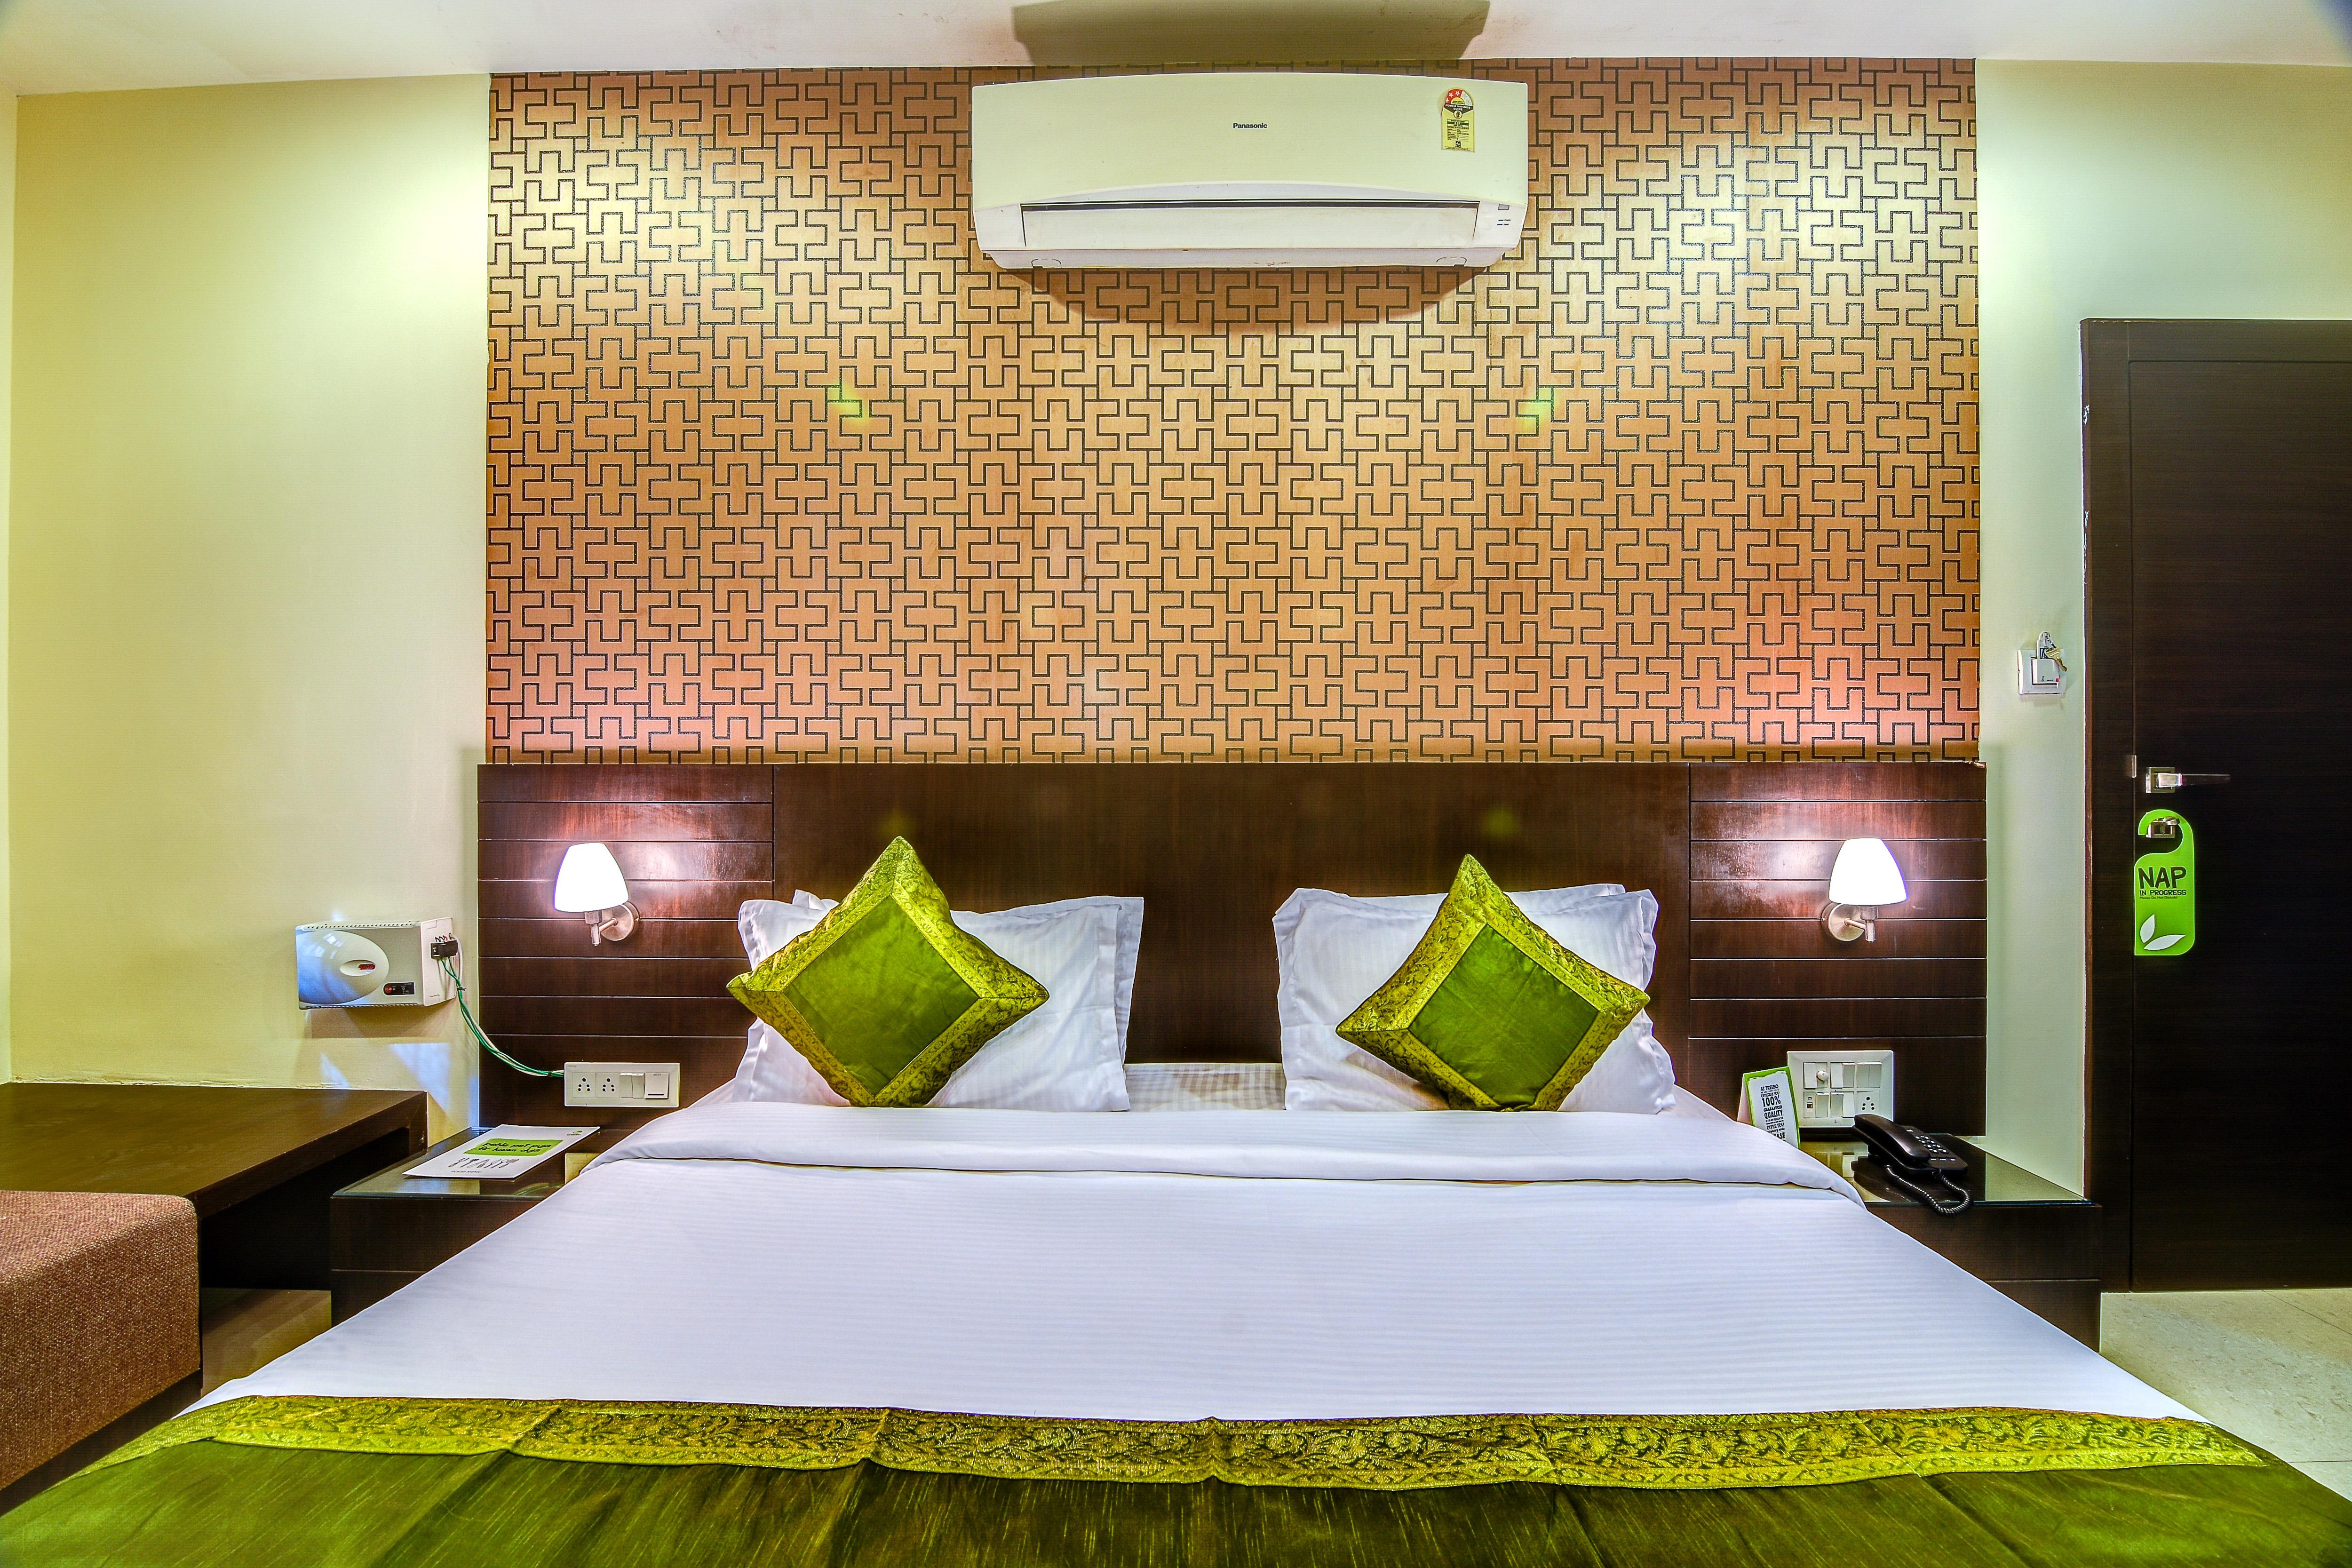 Hotels near Mp Nagar Bhopal | Tariff ₹799, Lowest Price